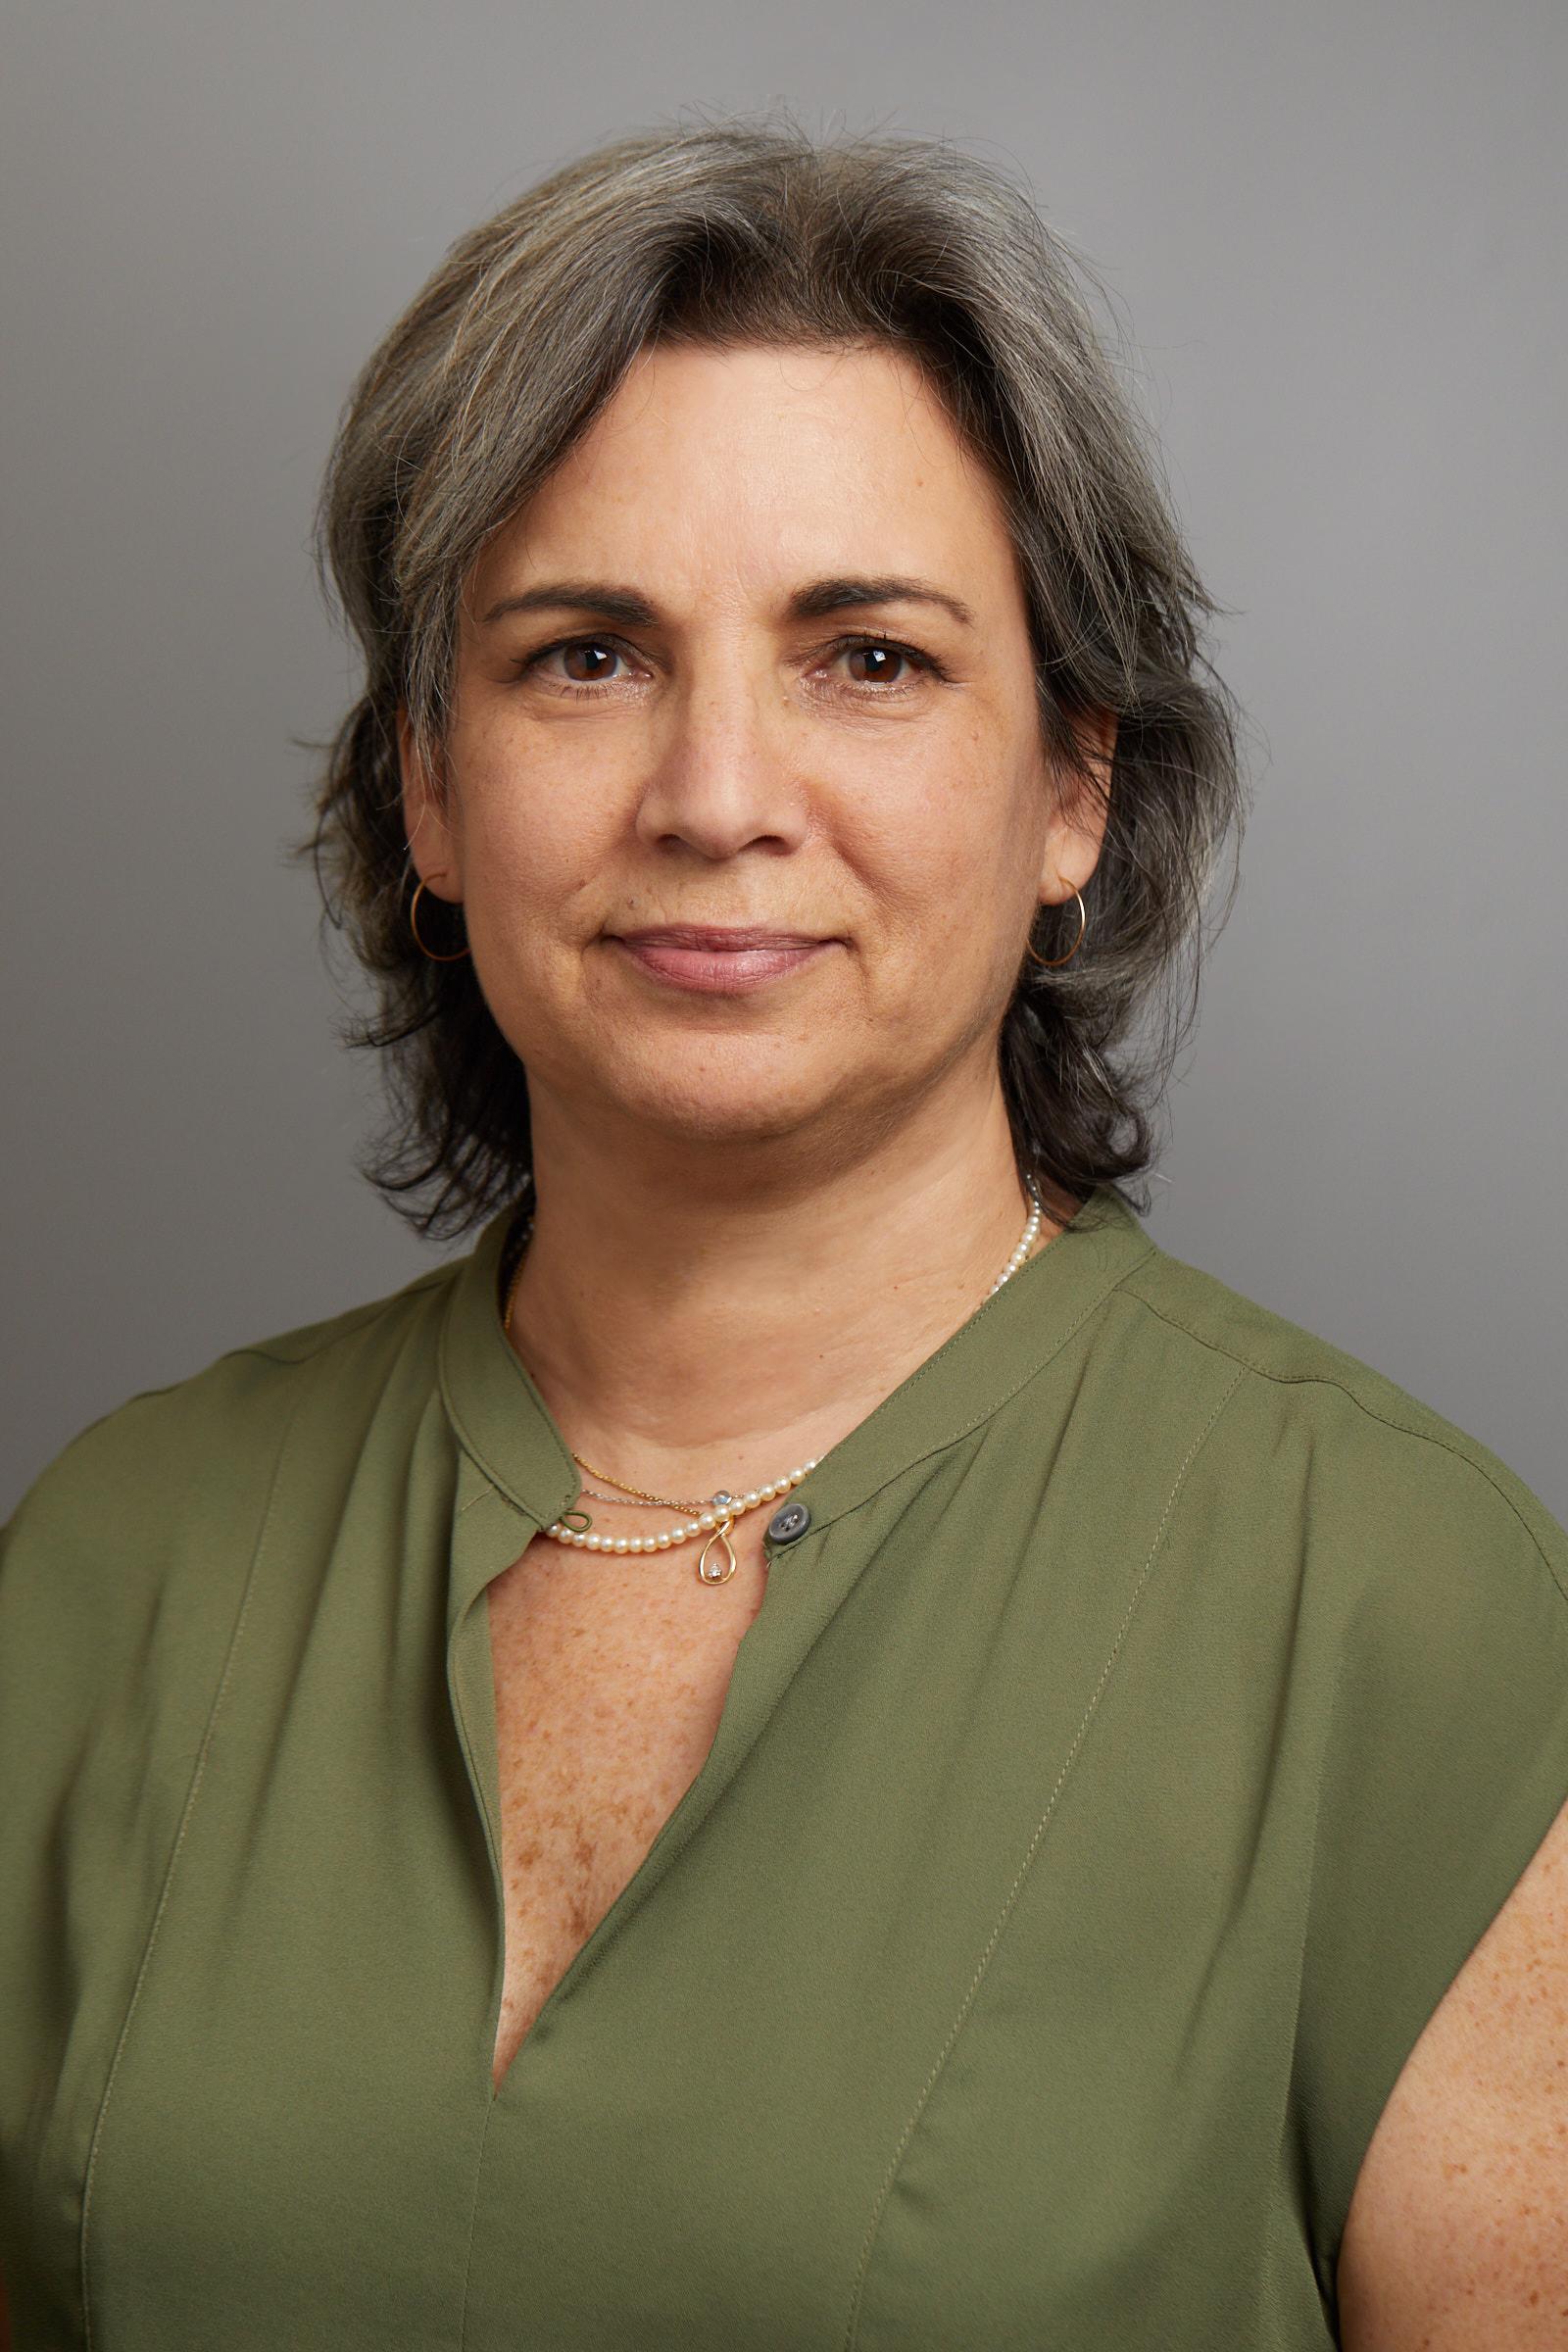 Nina Stachenfeld, PhD > Obstetrics, Gynecology & Reproductive